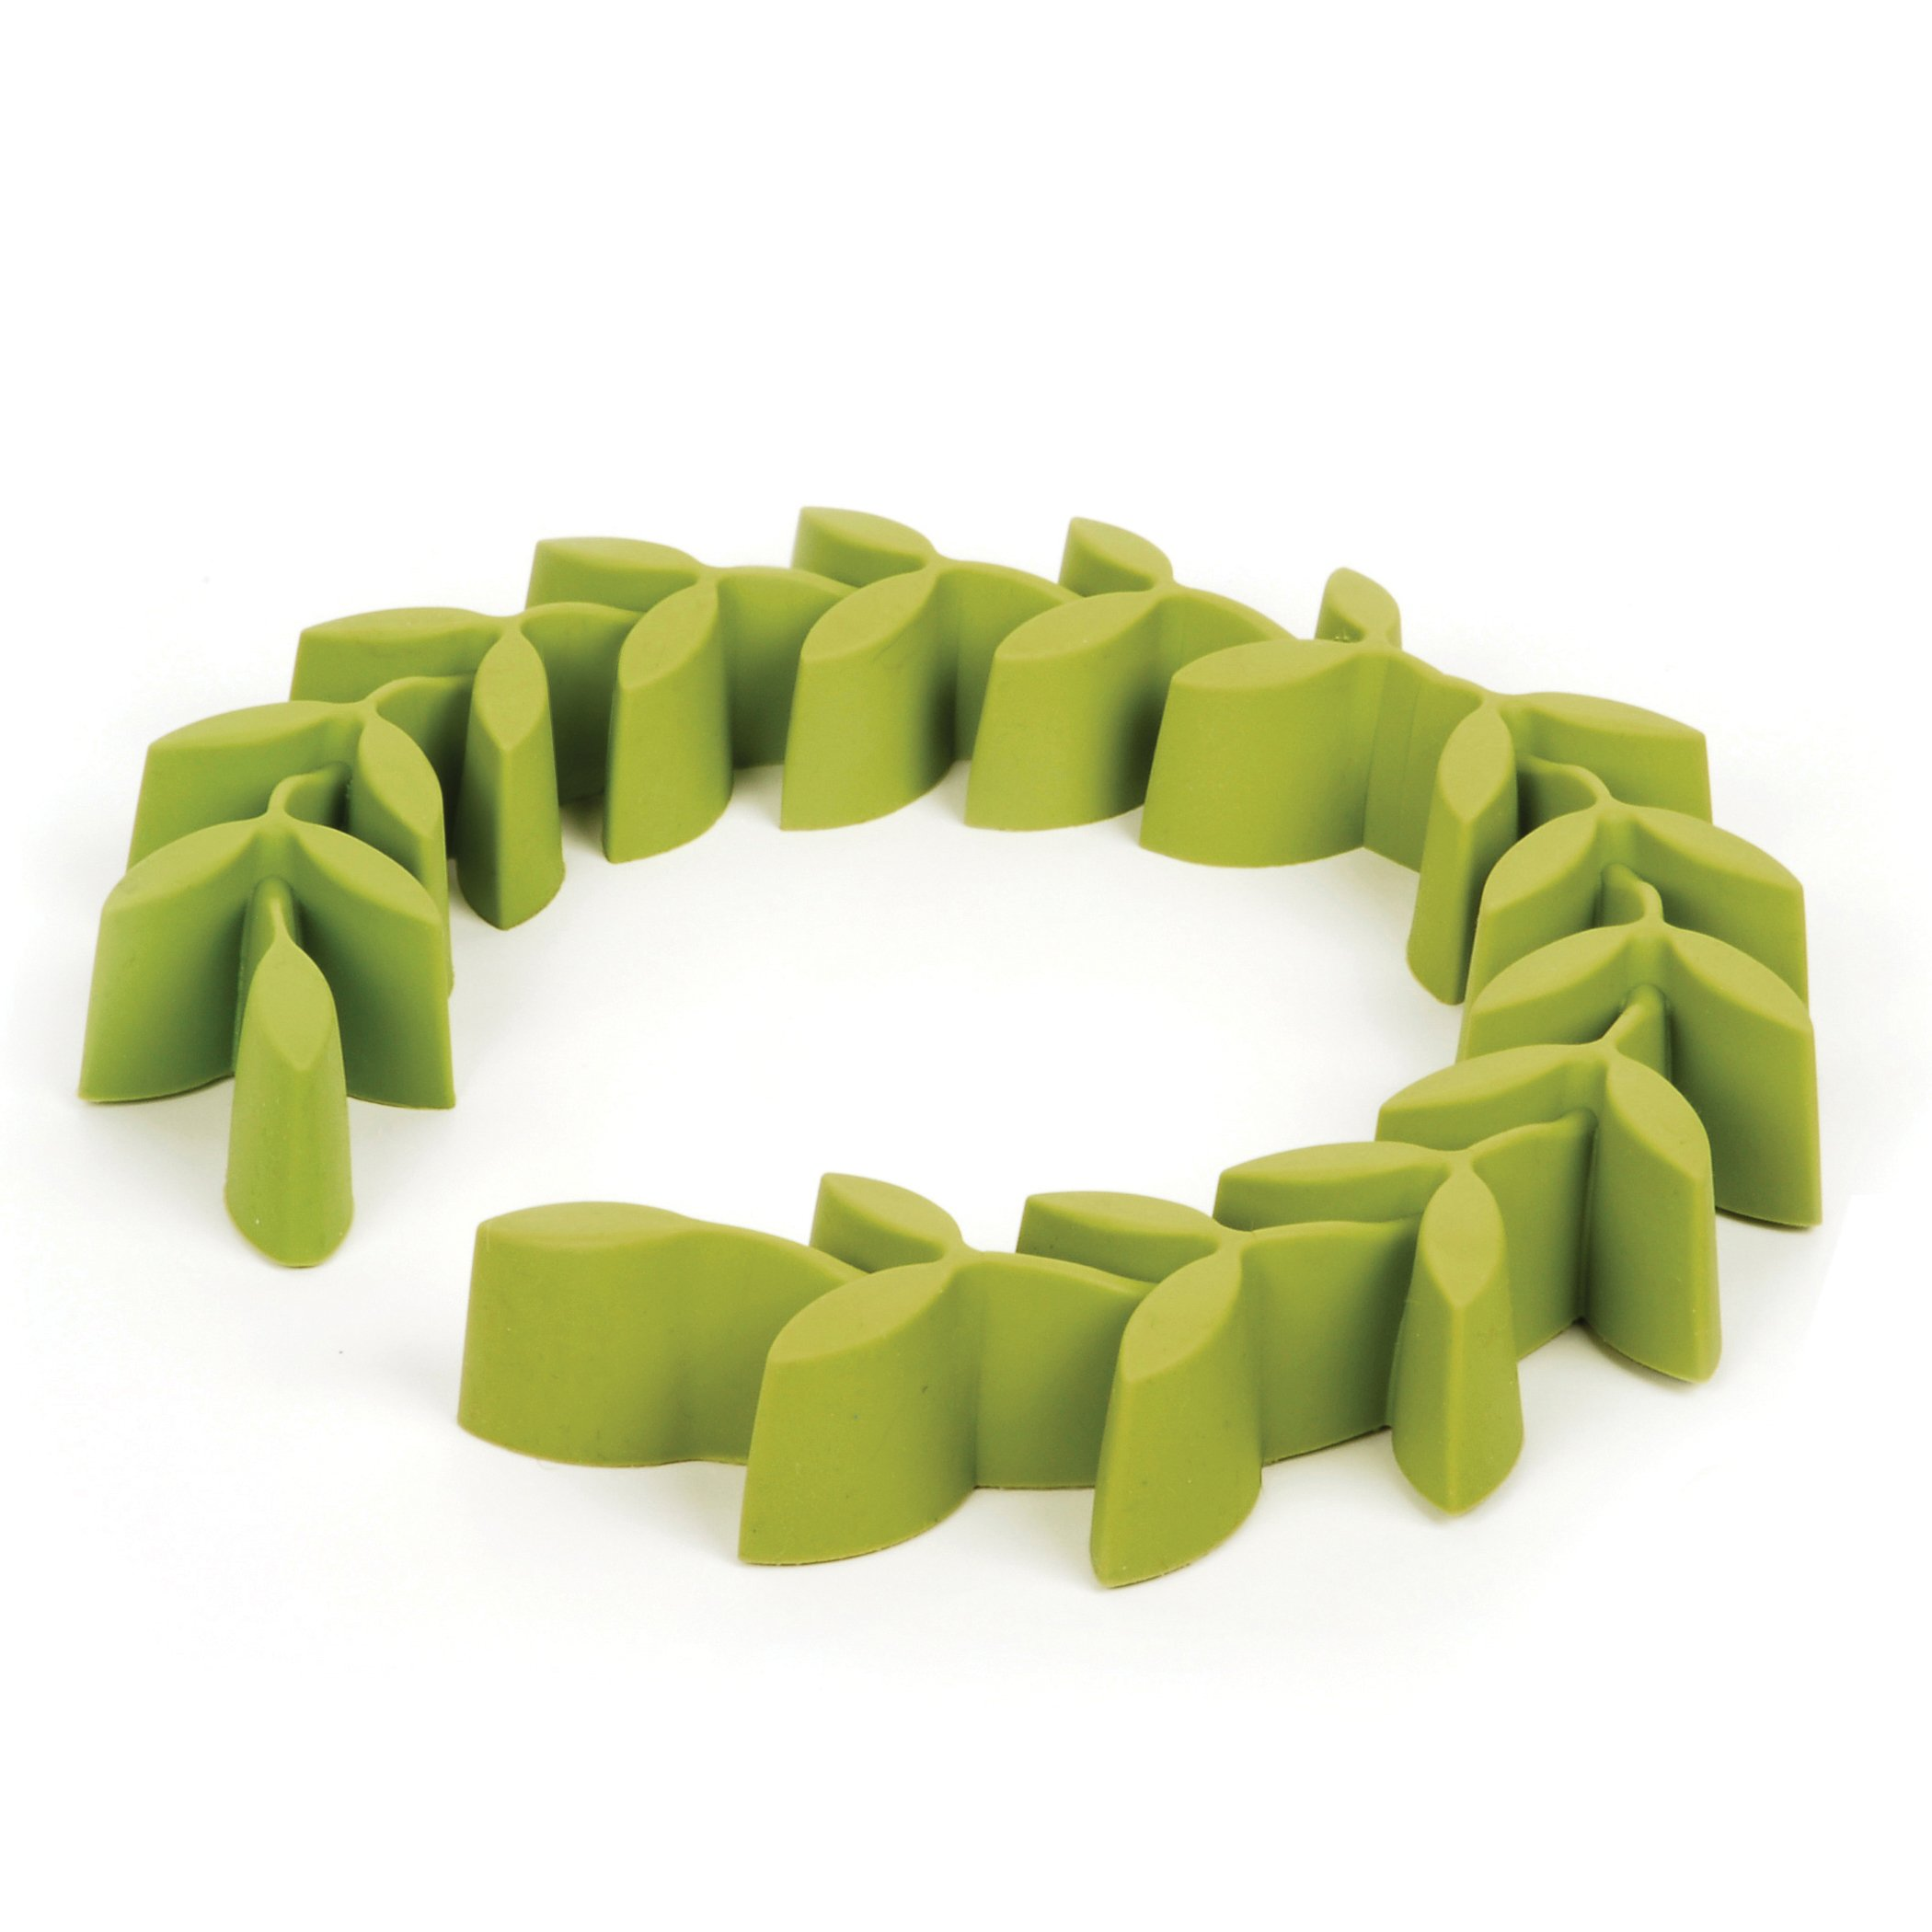 Prepara 3034 Flexible Roasting Laurel Rack, Large, Green by Prepara